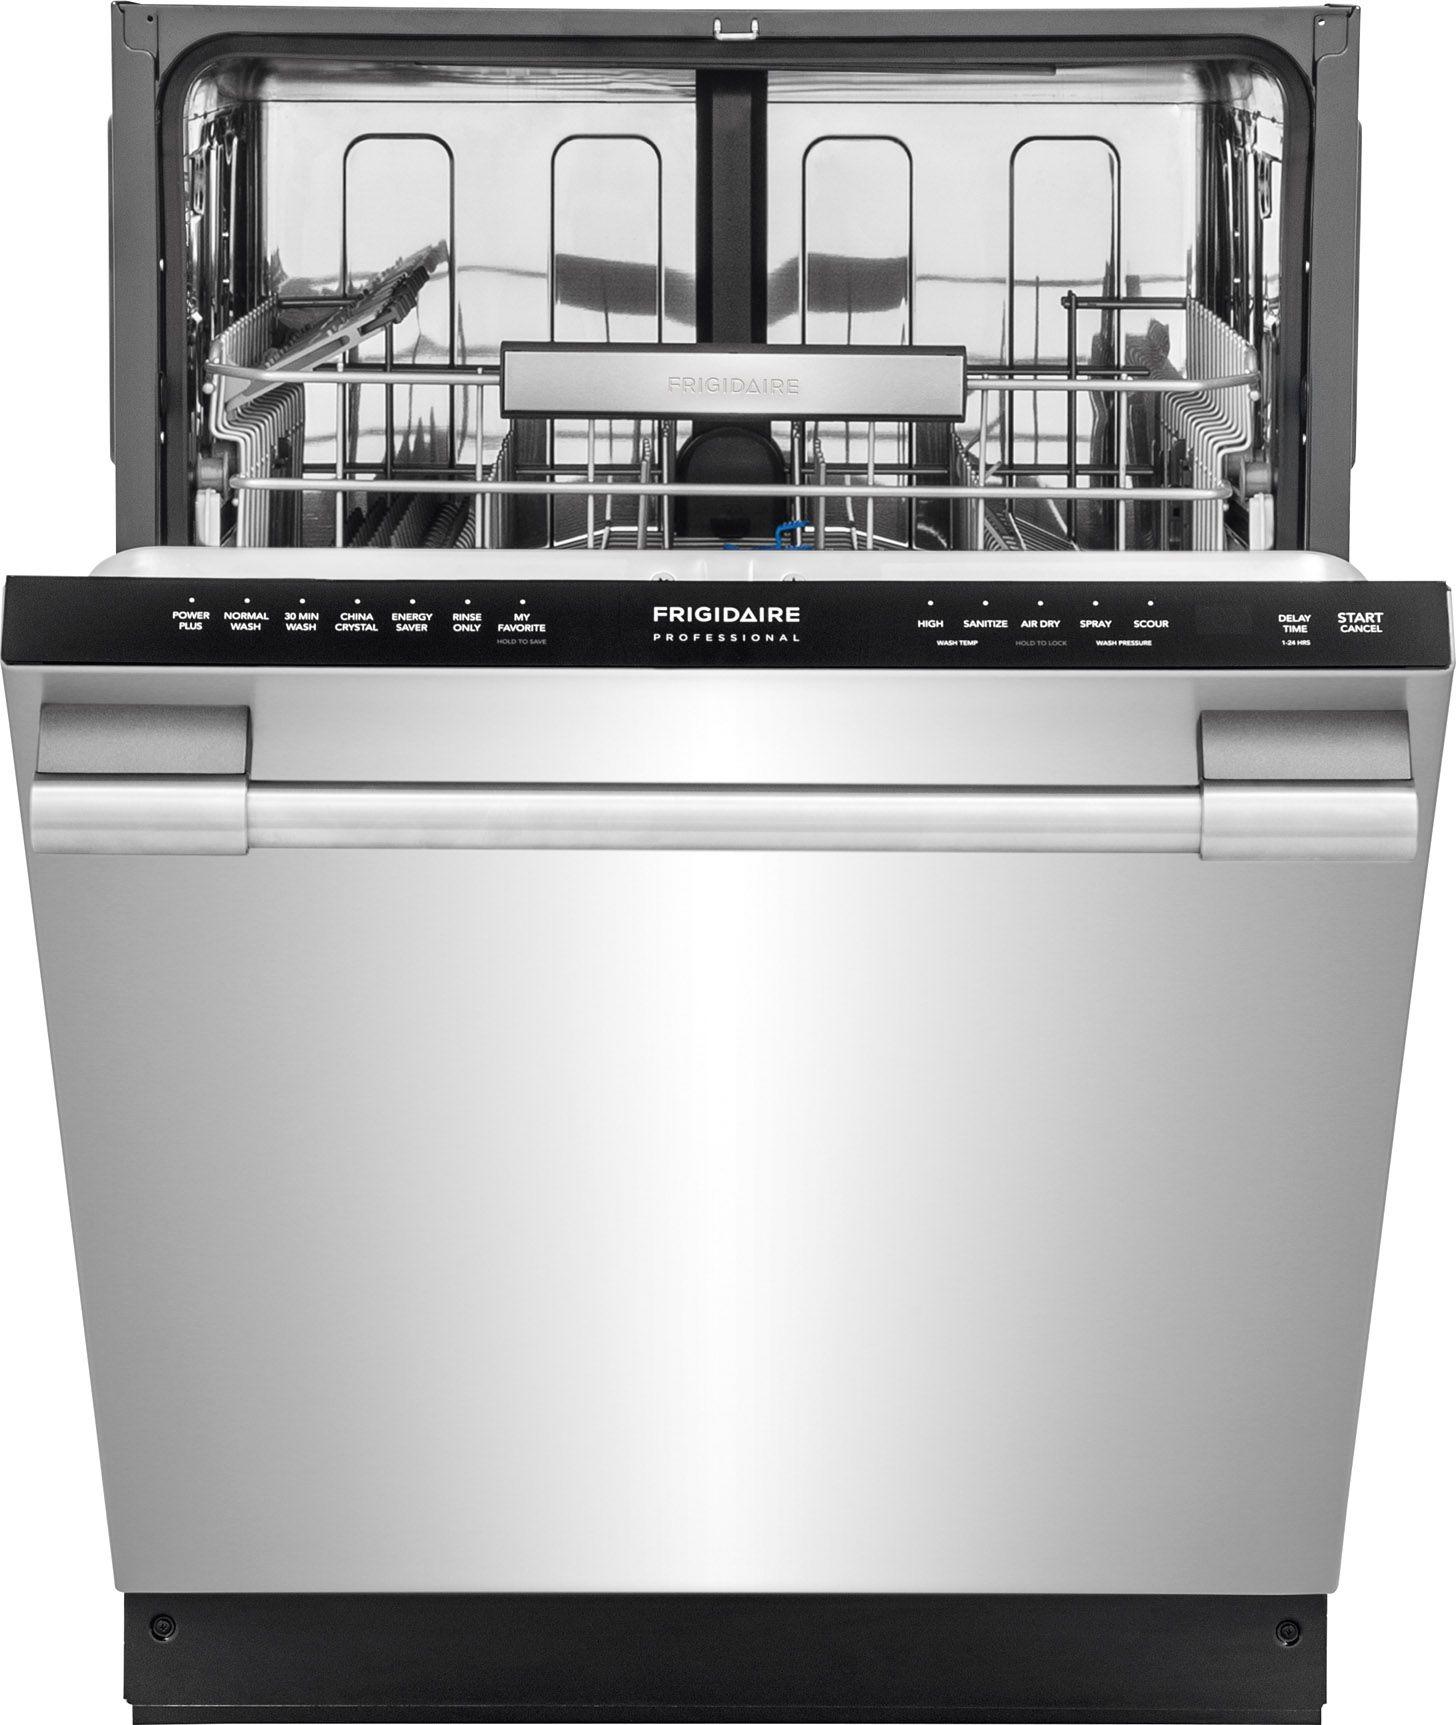 Frigidaire Professional Dishwasher Frigidaire Professional Home Renovation Kitchen Remodel